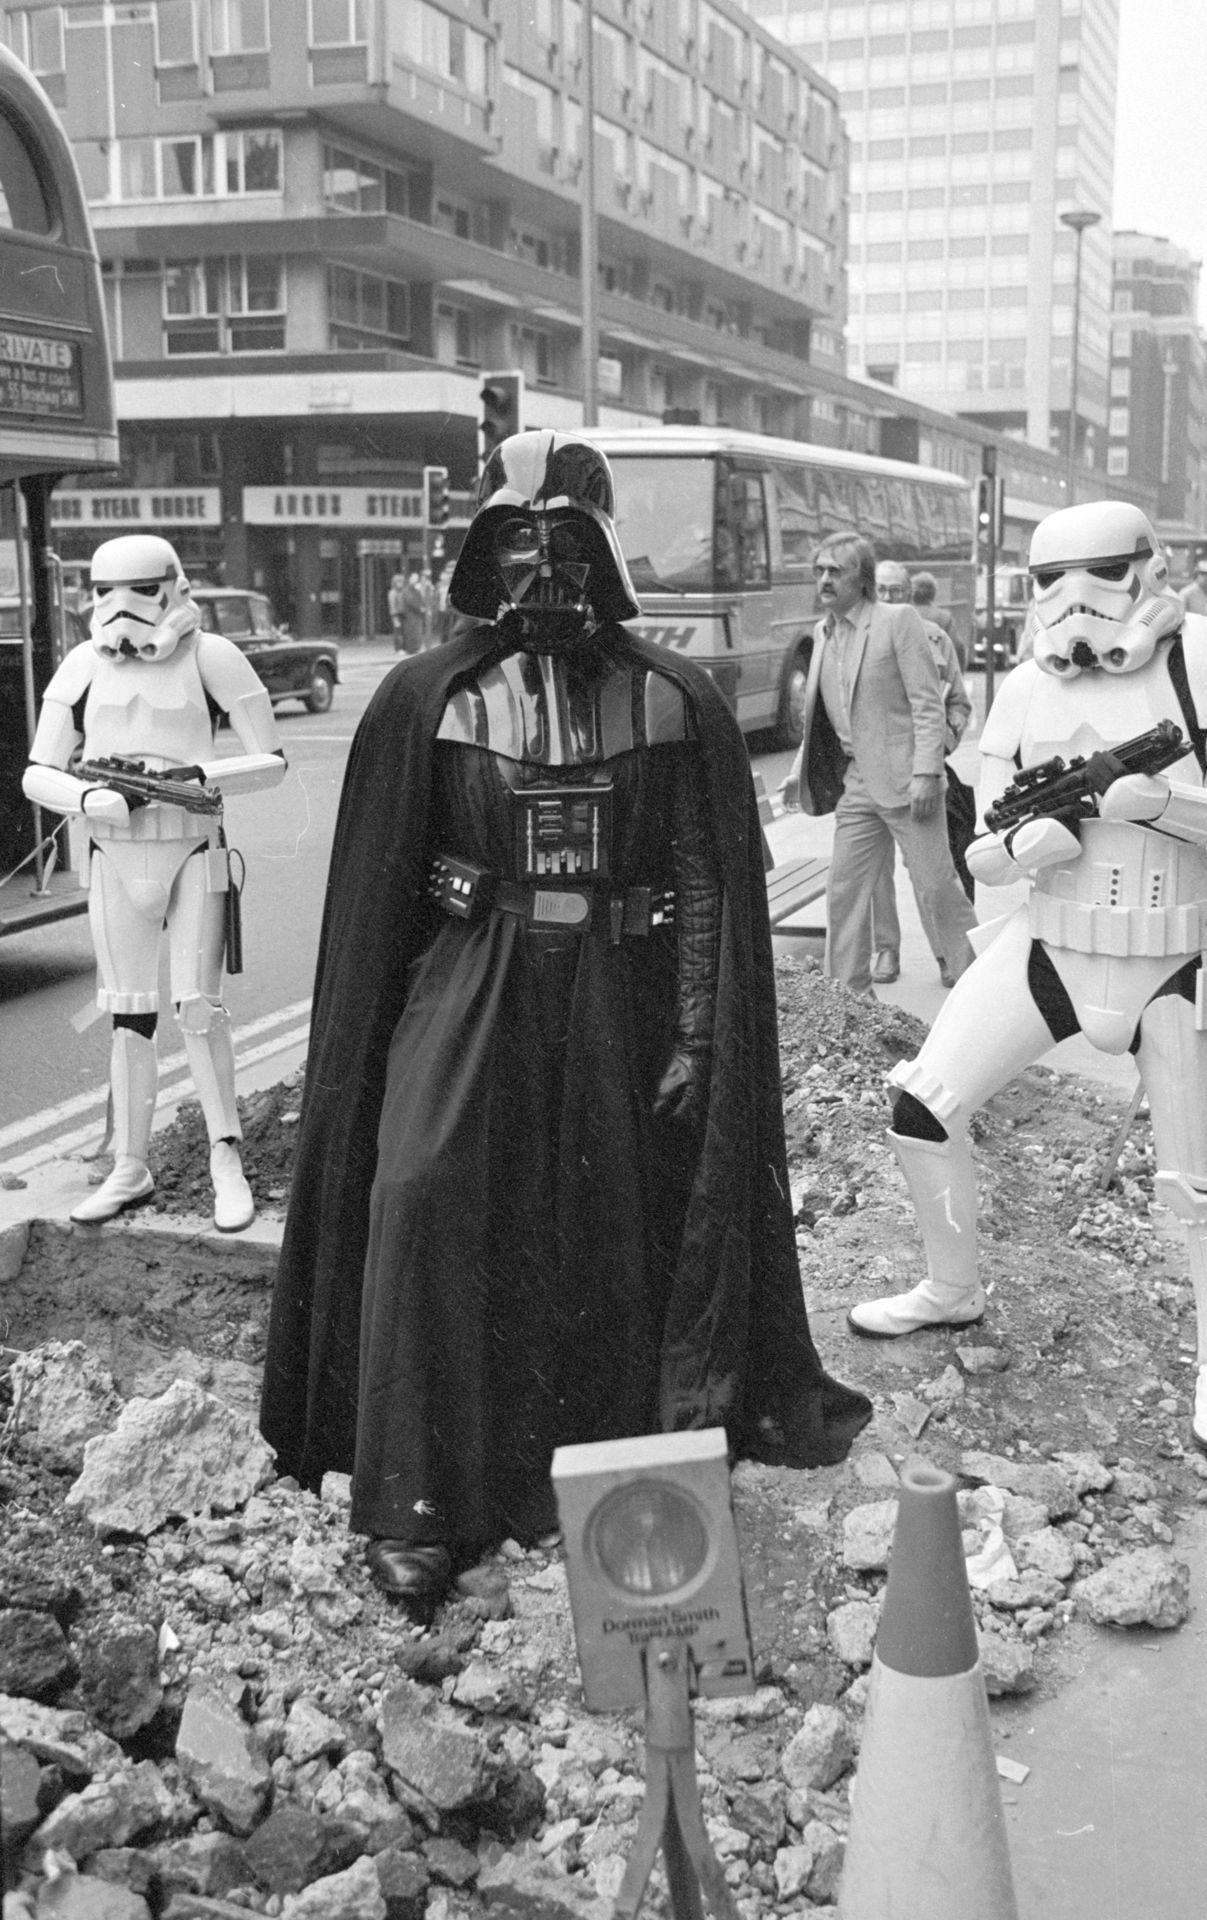 Five Benefits Of Chartering Your Fifo Flights Star Wars Darth Vader War